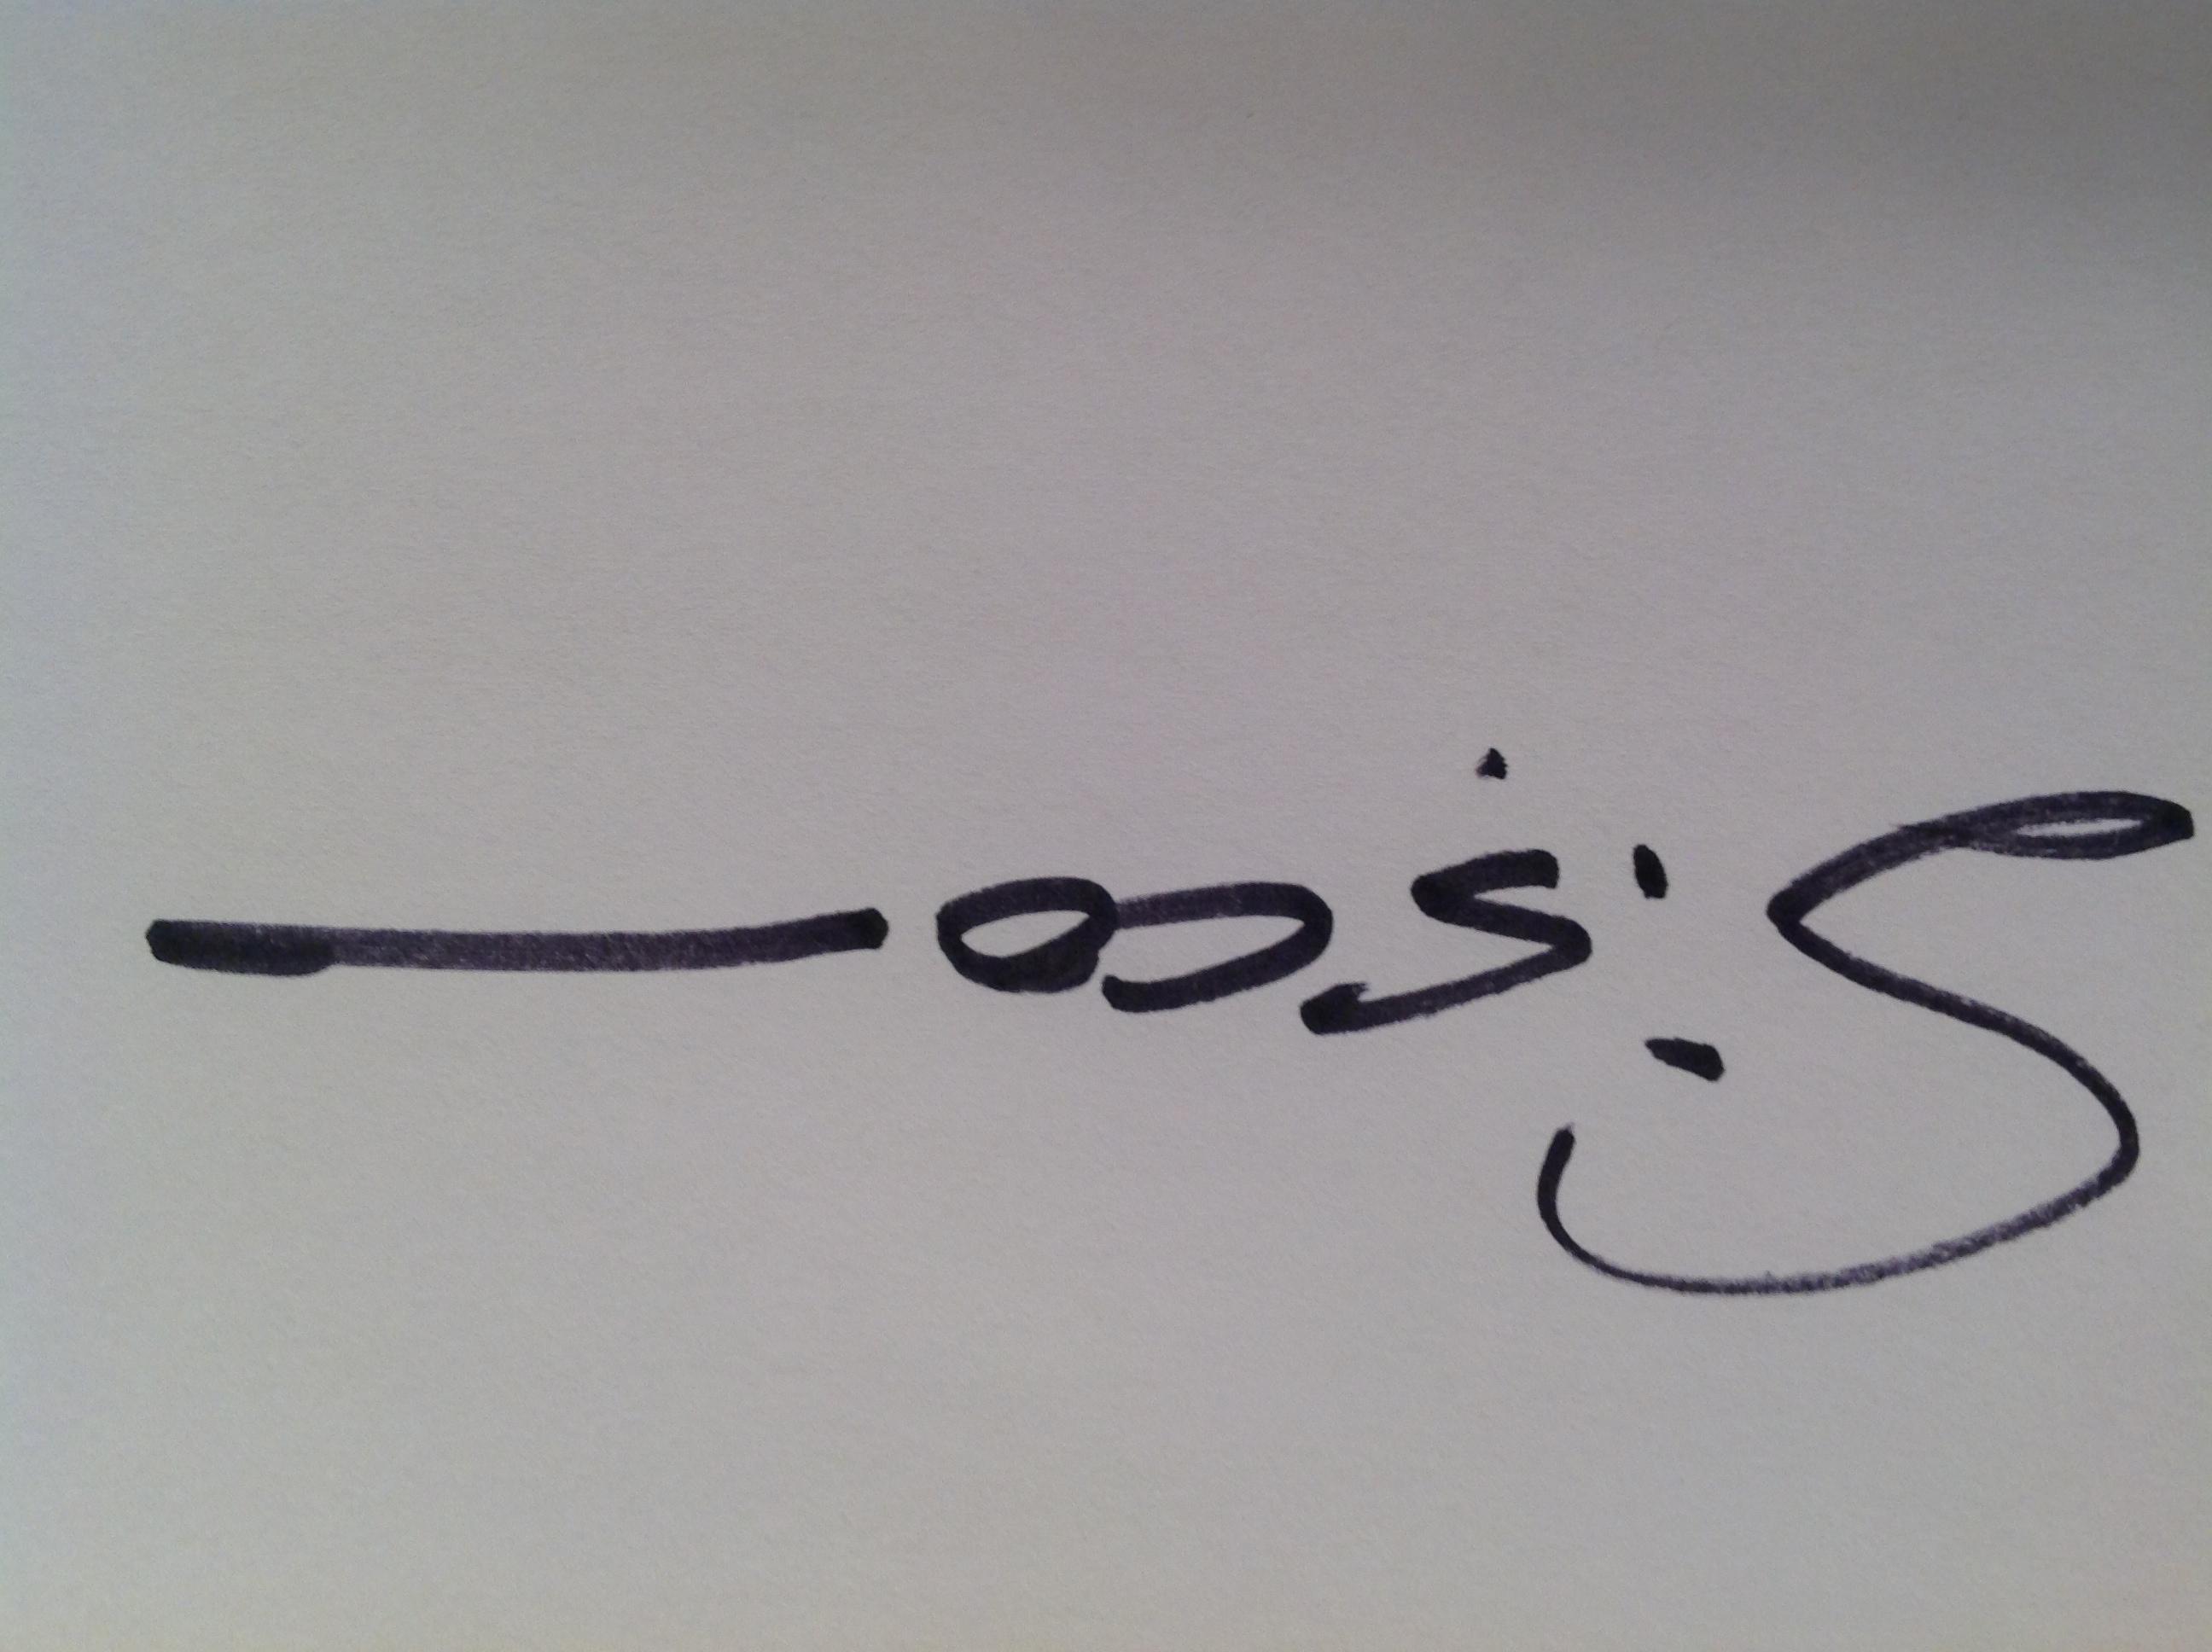 Kirk Sisco Signature